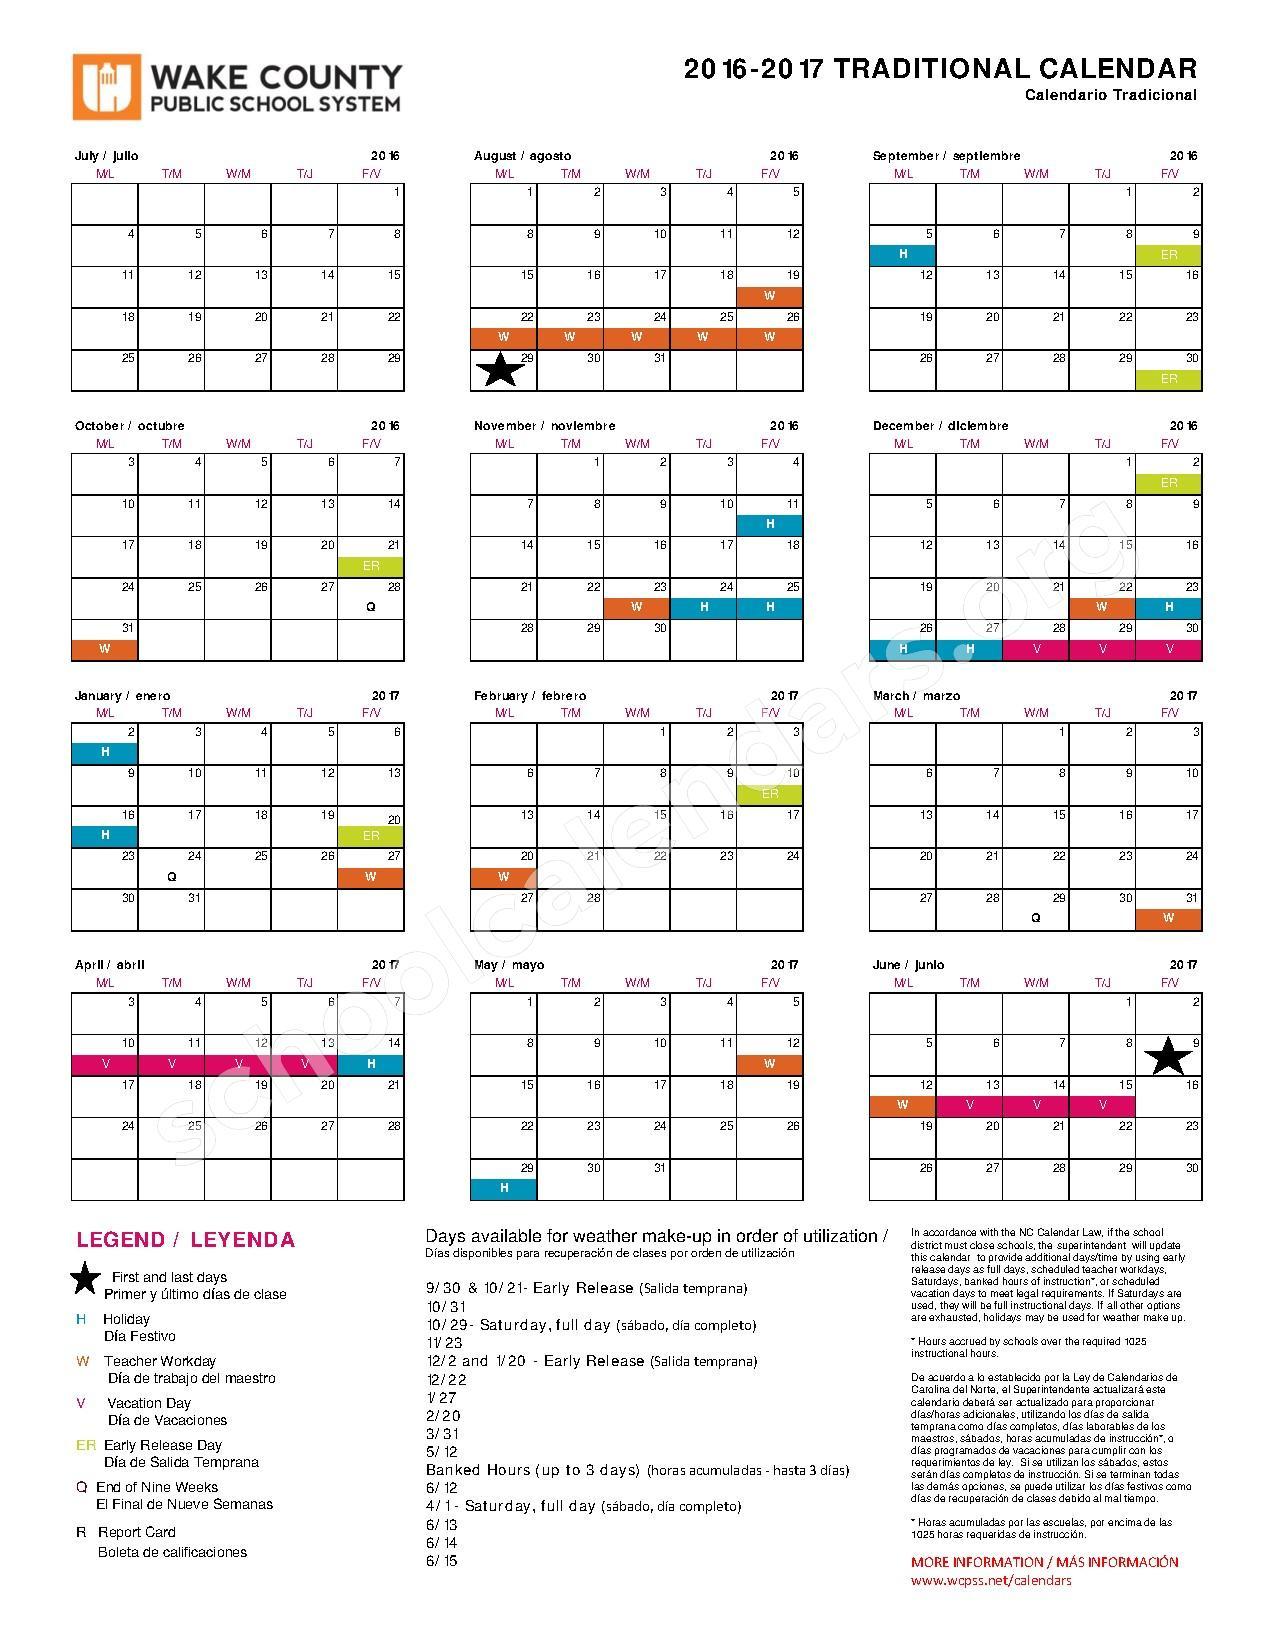 Wake County School System Calendars   Printable Calendar Throughout Wake County Public School System Tracks